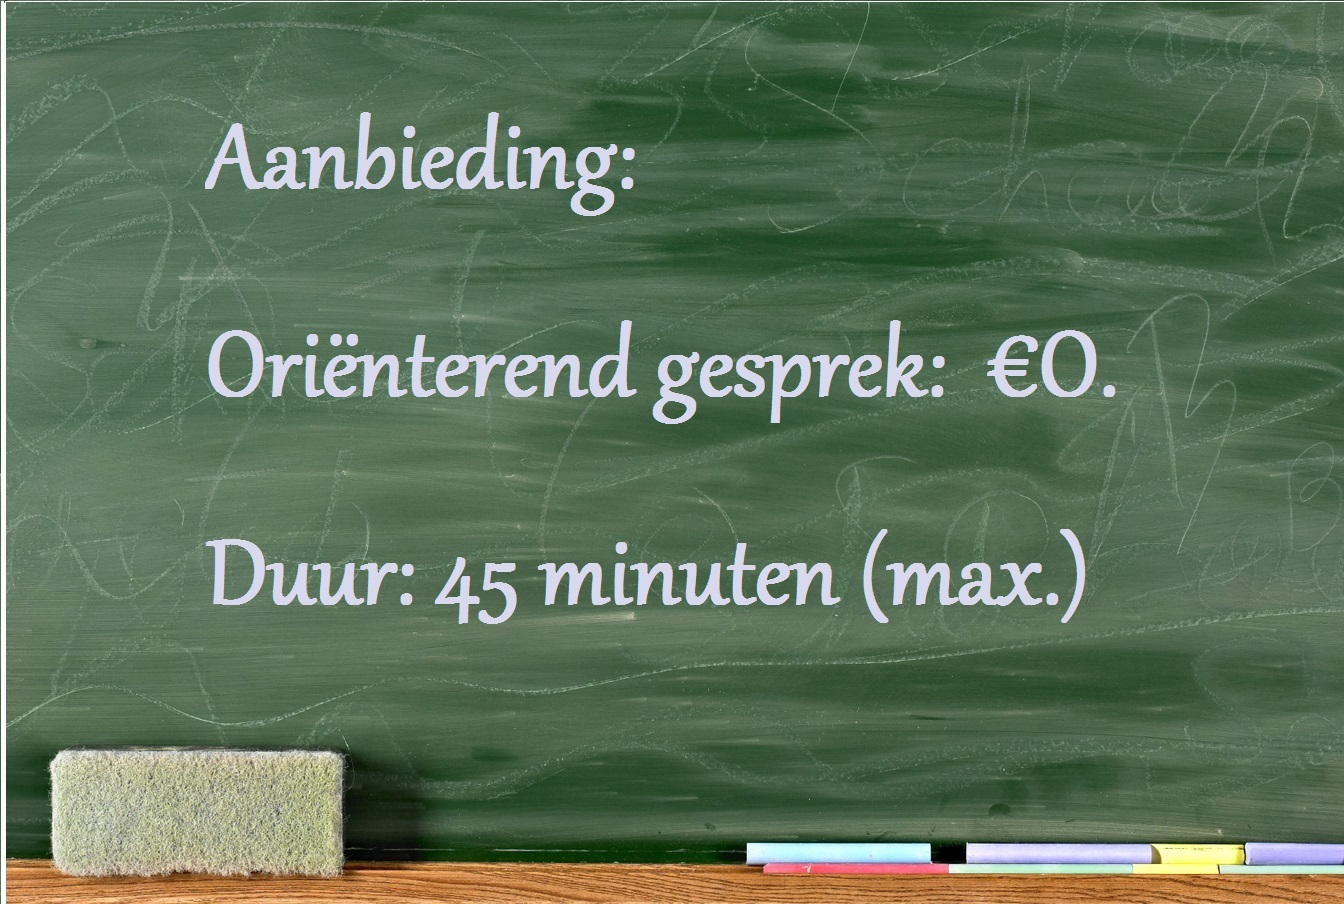 4website - Aanbiedg orienternd gespr €0